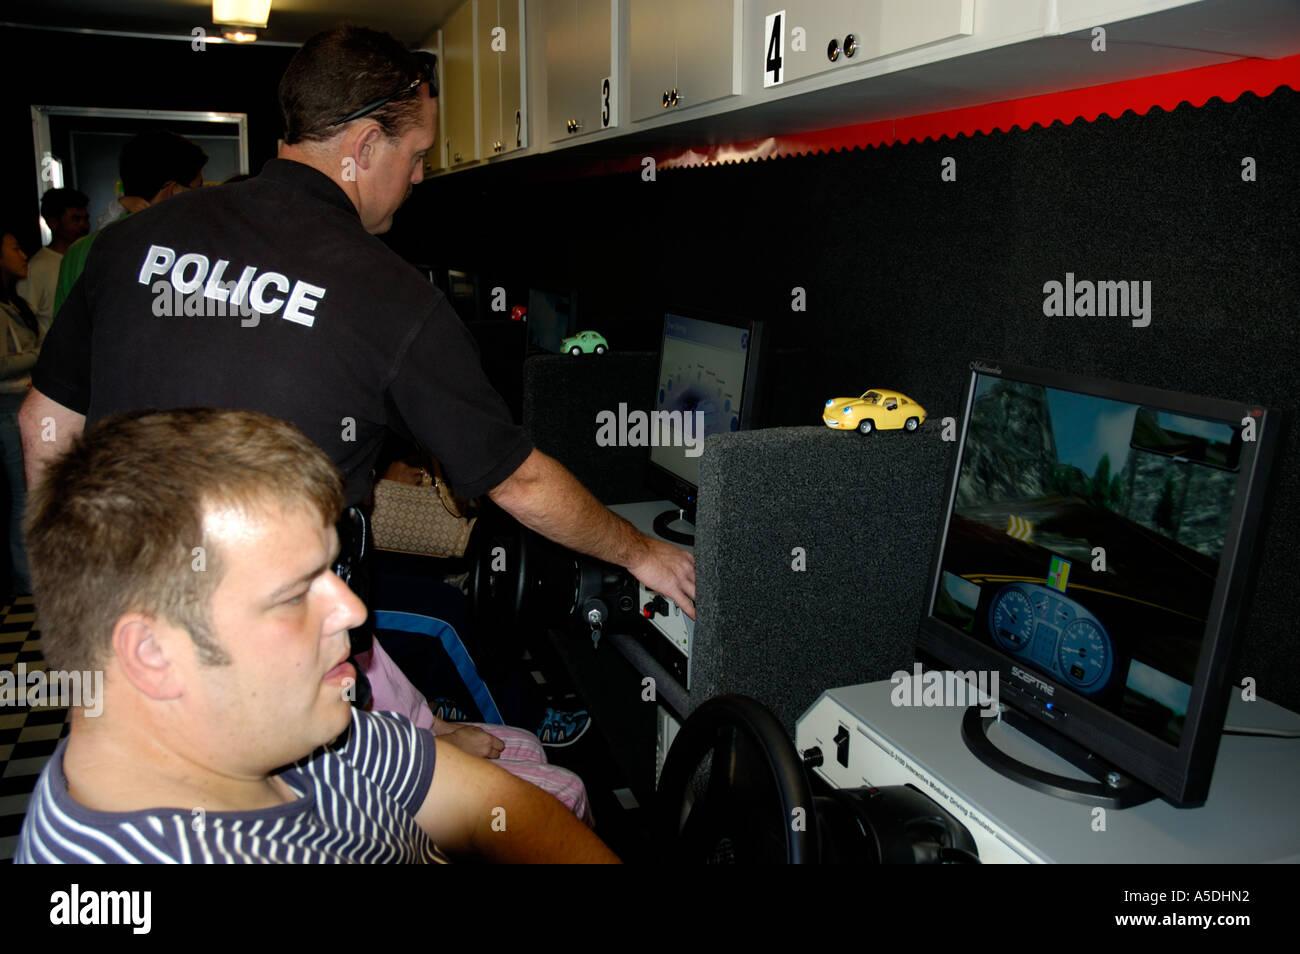 Police Simulator Stockfotos & Police Simulator Bilder - Alamy